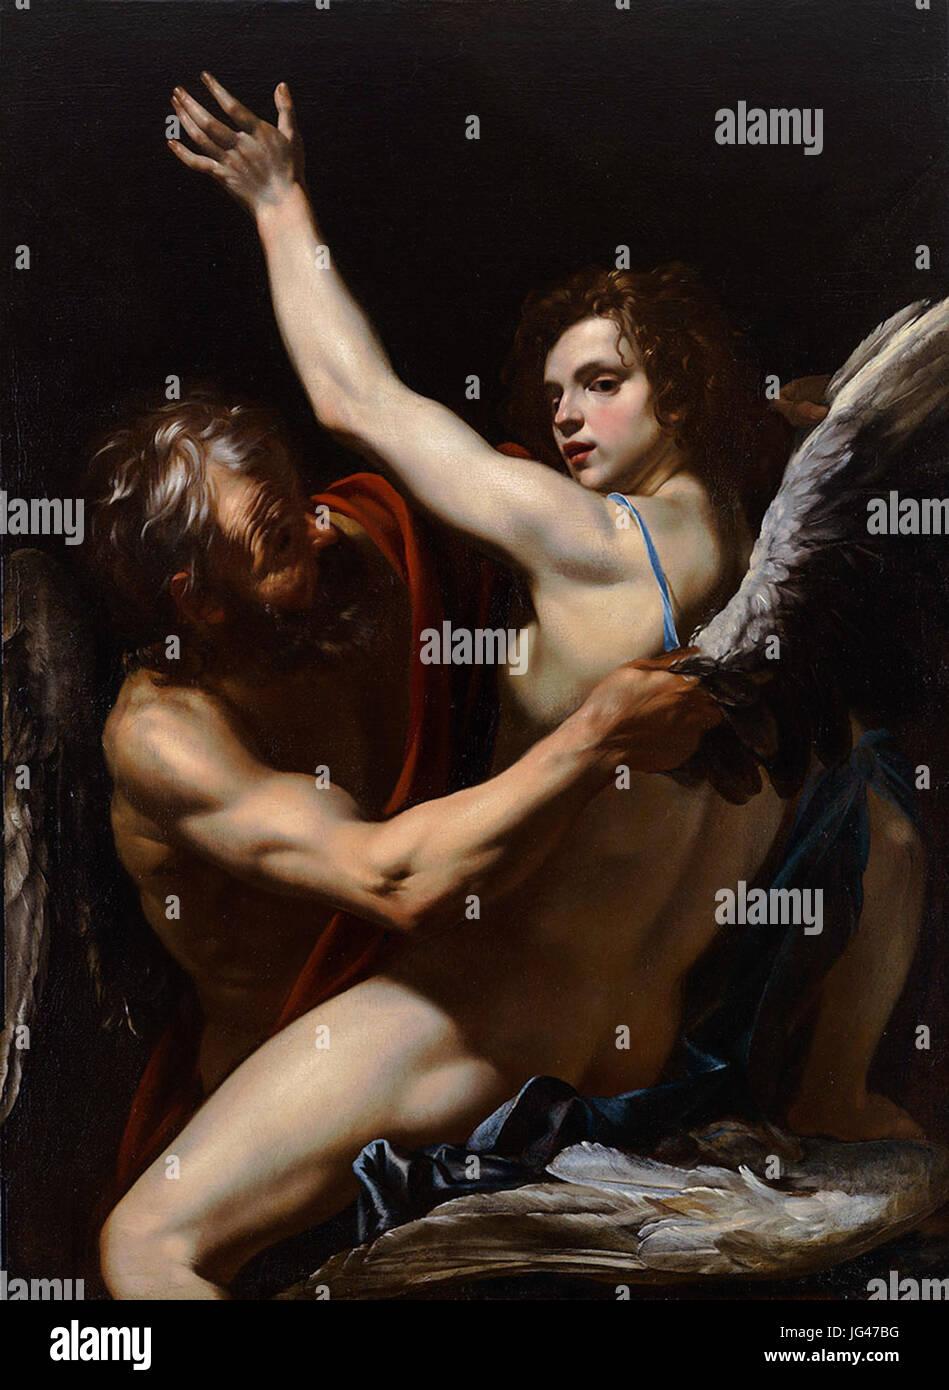 Orazio Riminaldi - Daedalus and Icarus - Stock Image